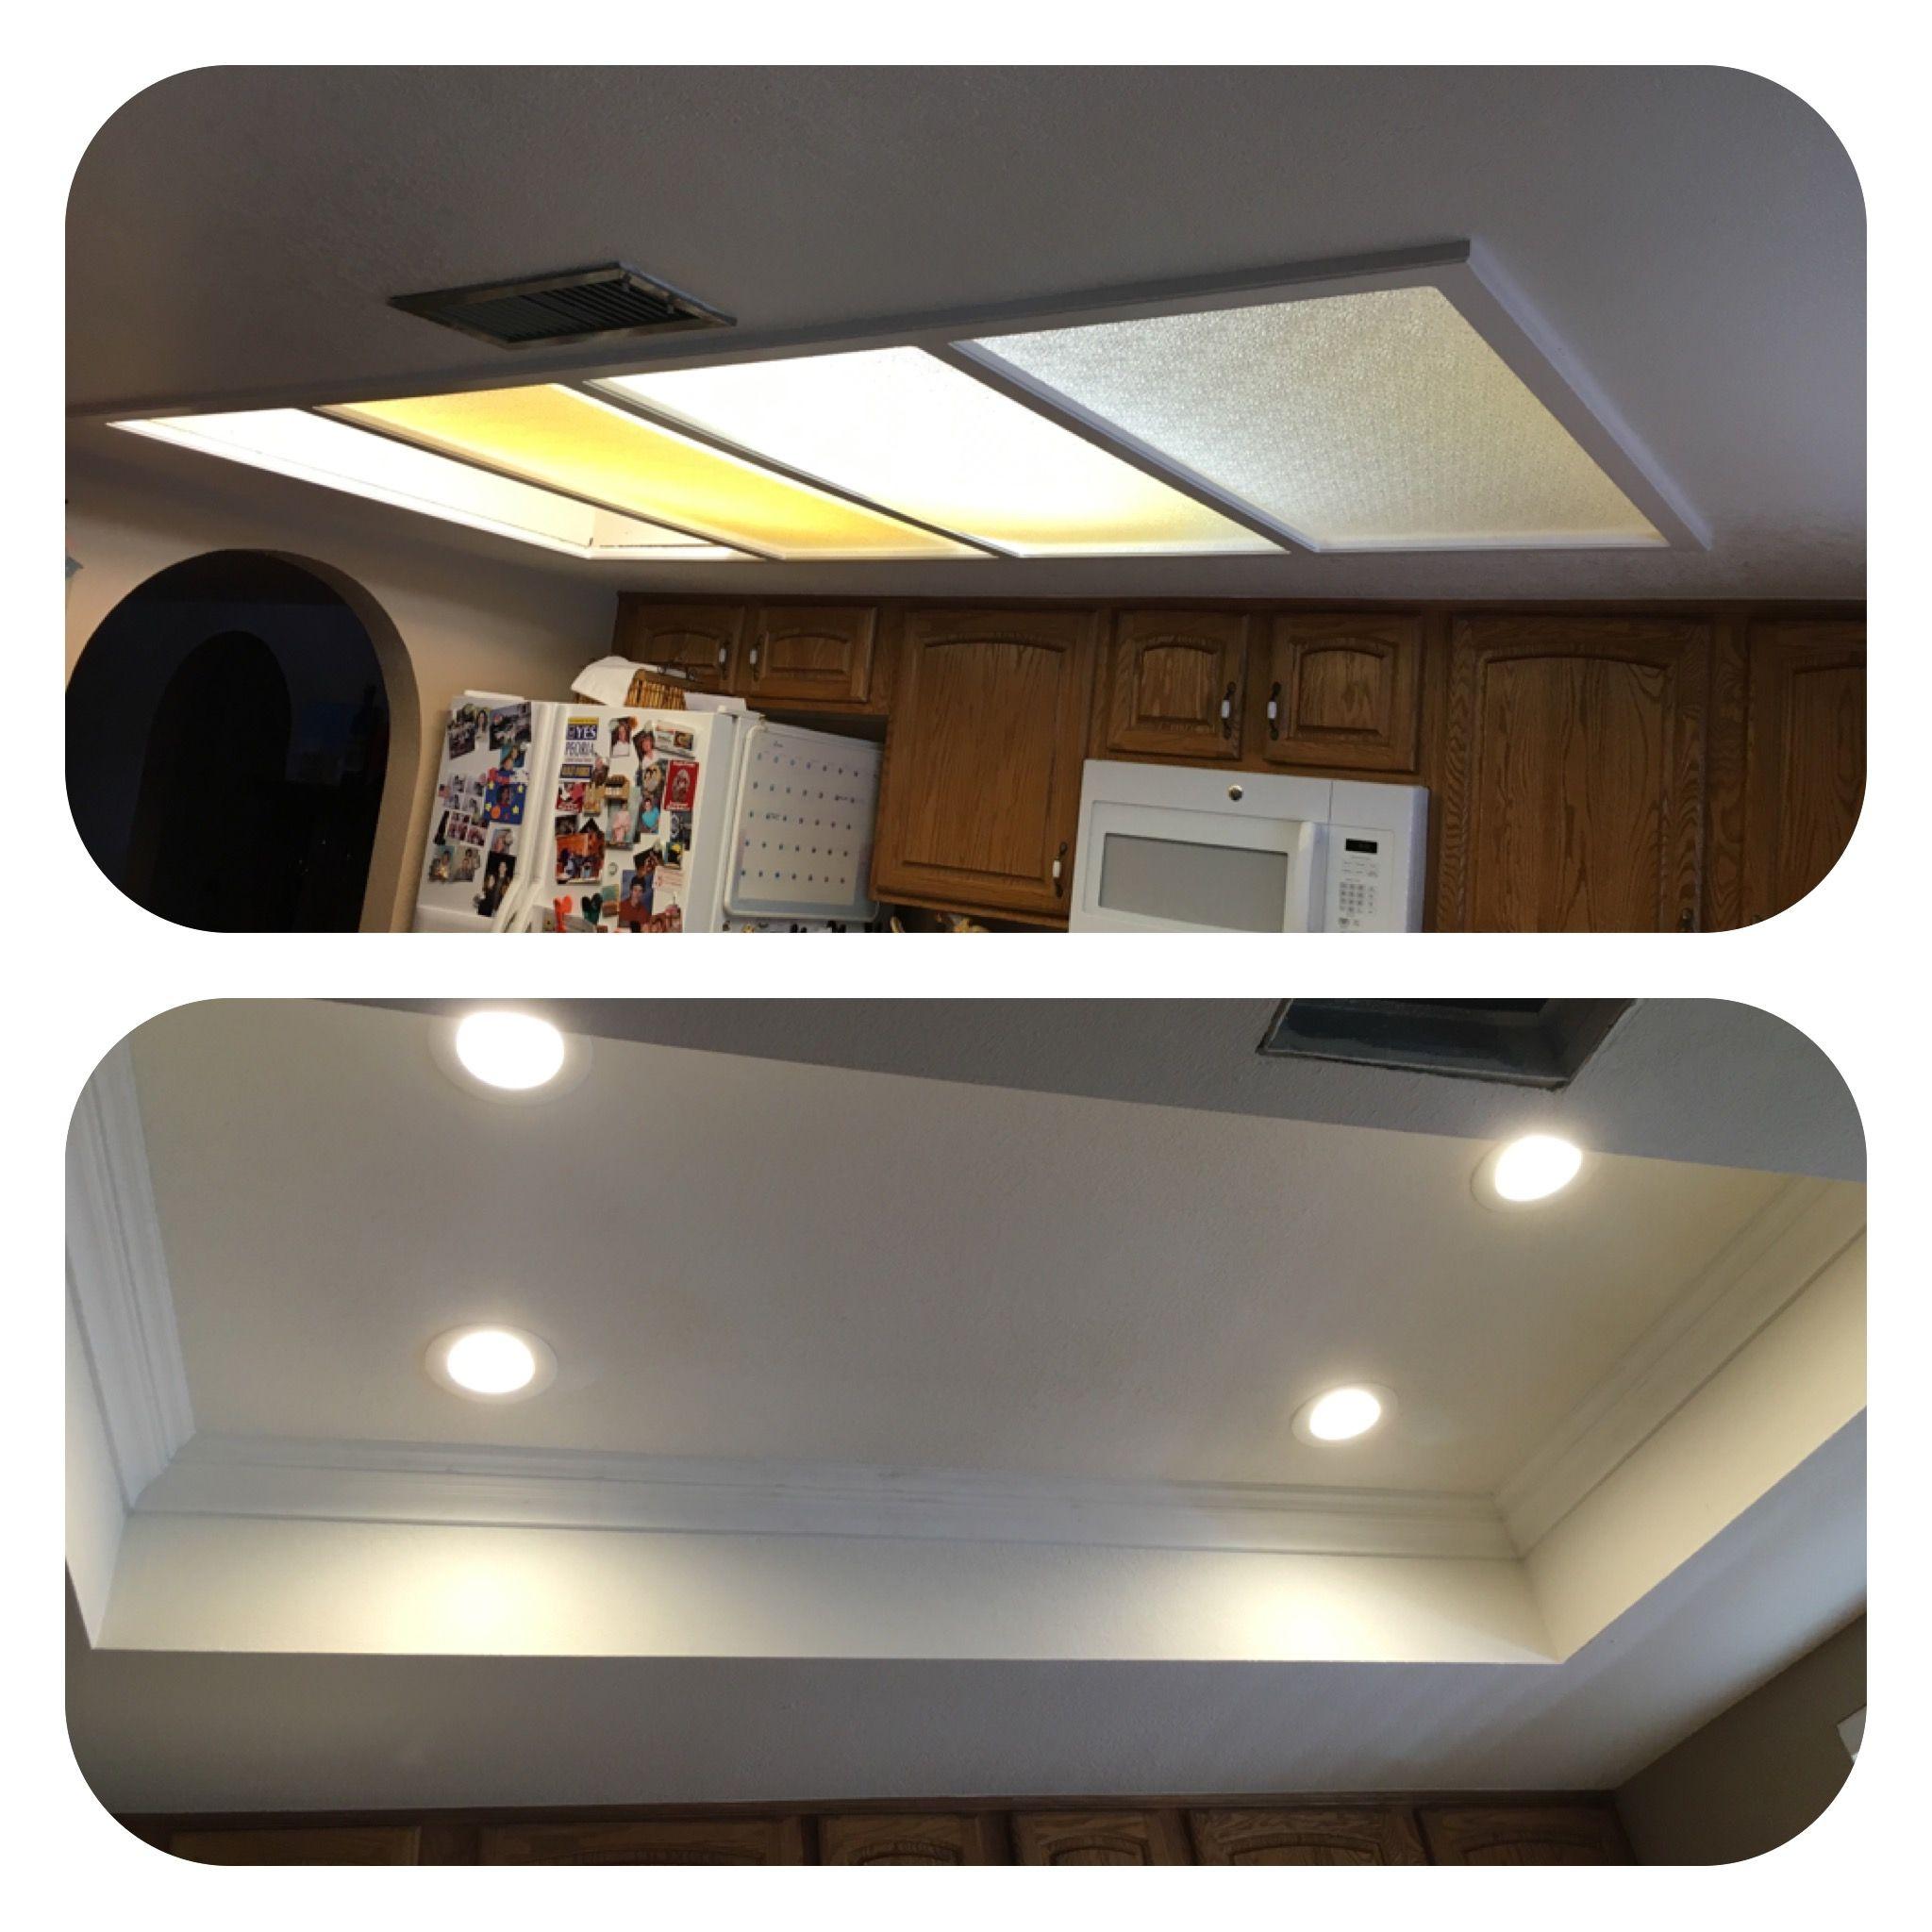 Image Result For Remodel Flourescent Light Box In Kitchen